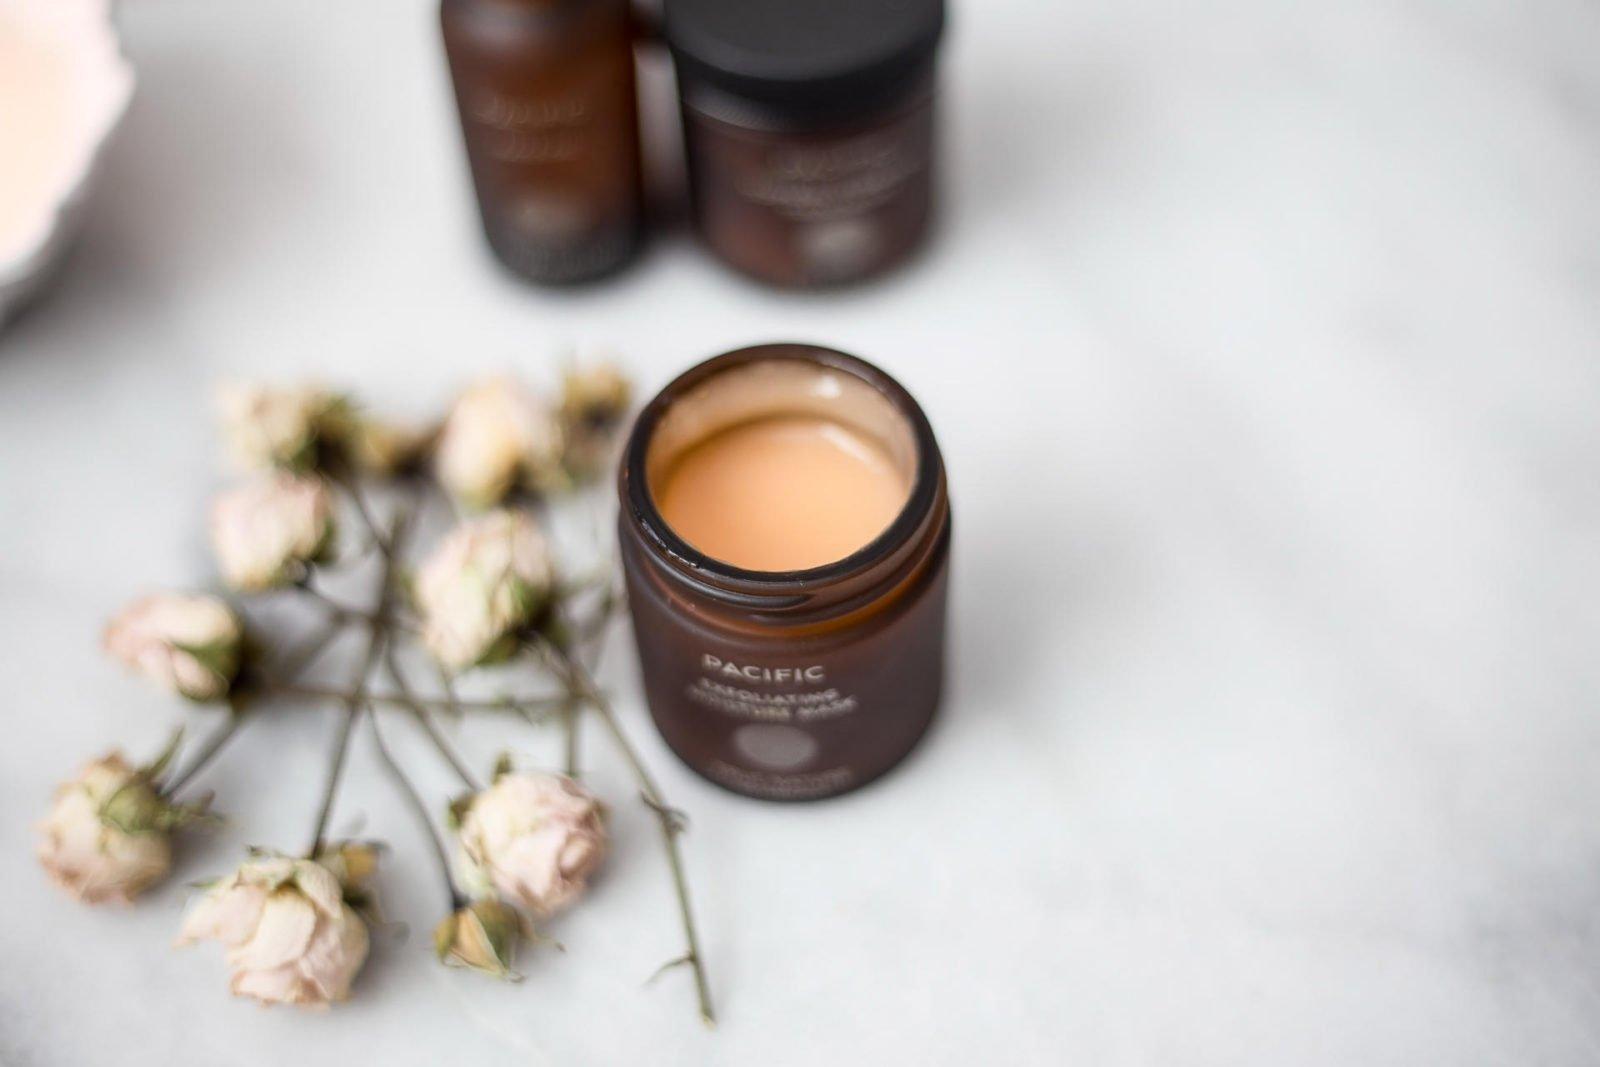 True Botanicals natural skincare exfoliating moisture mask